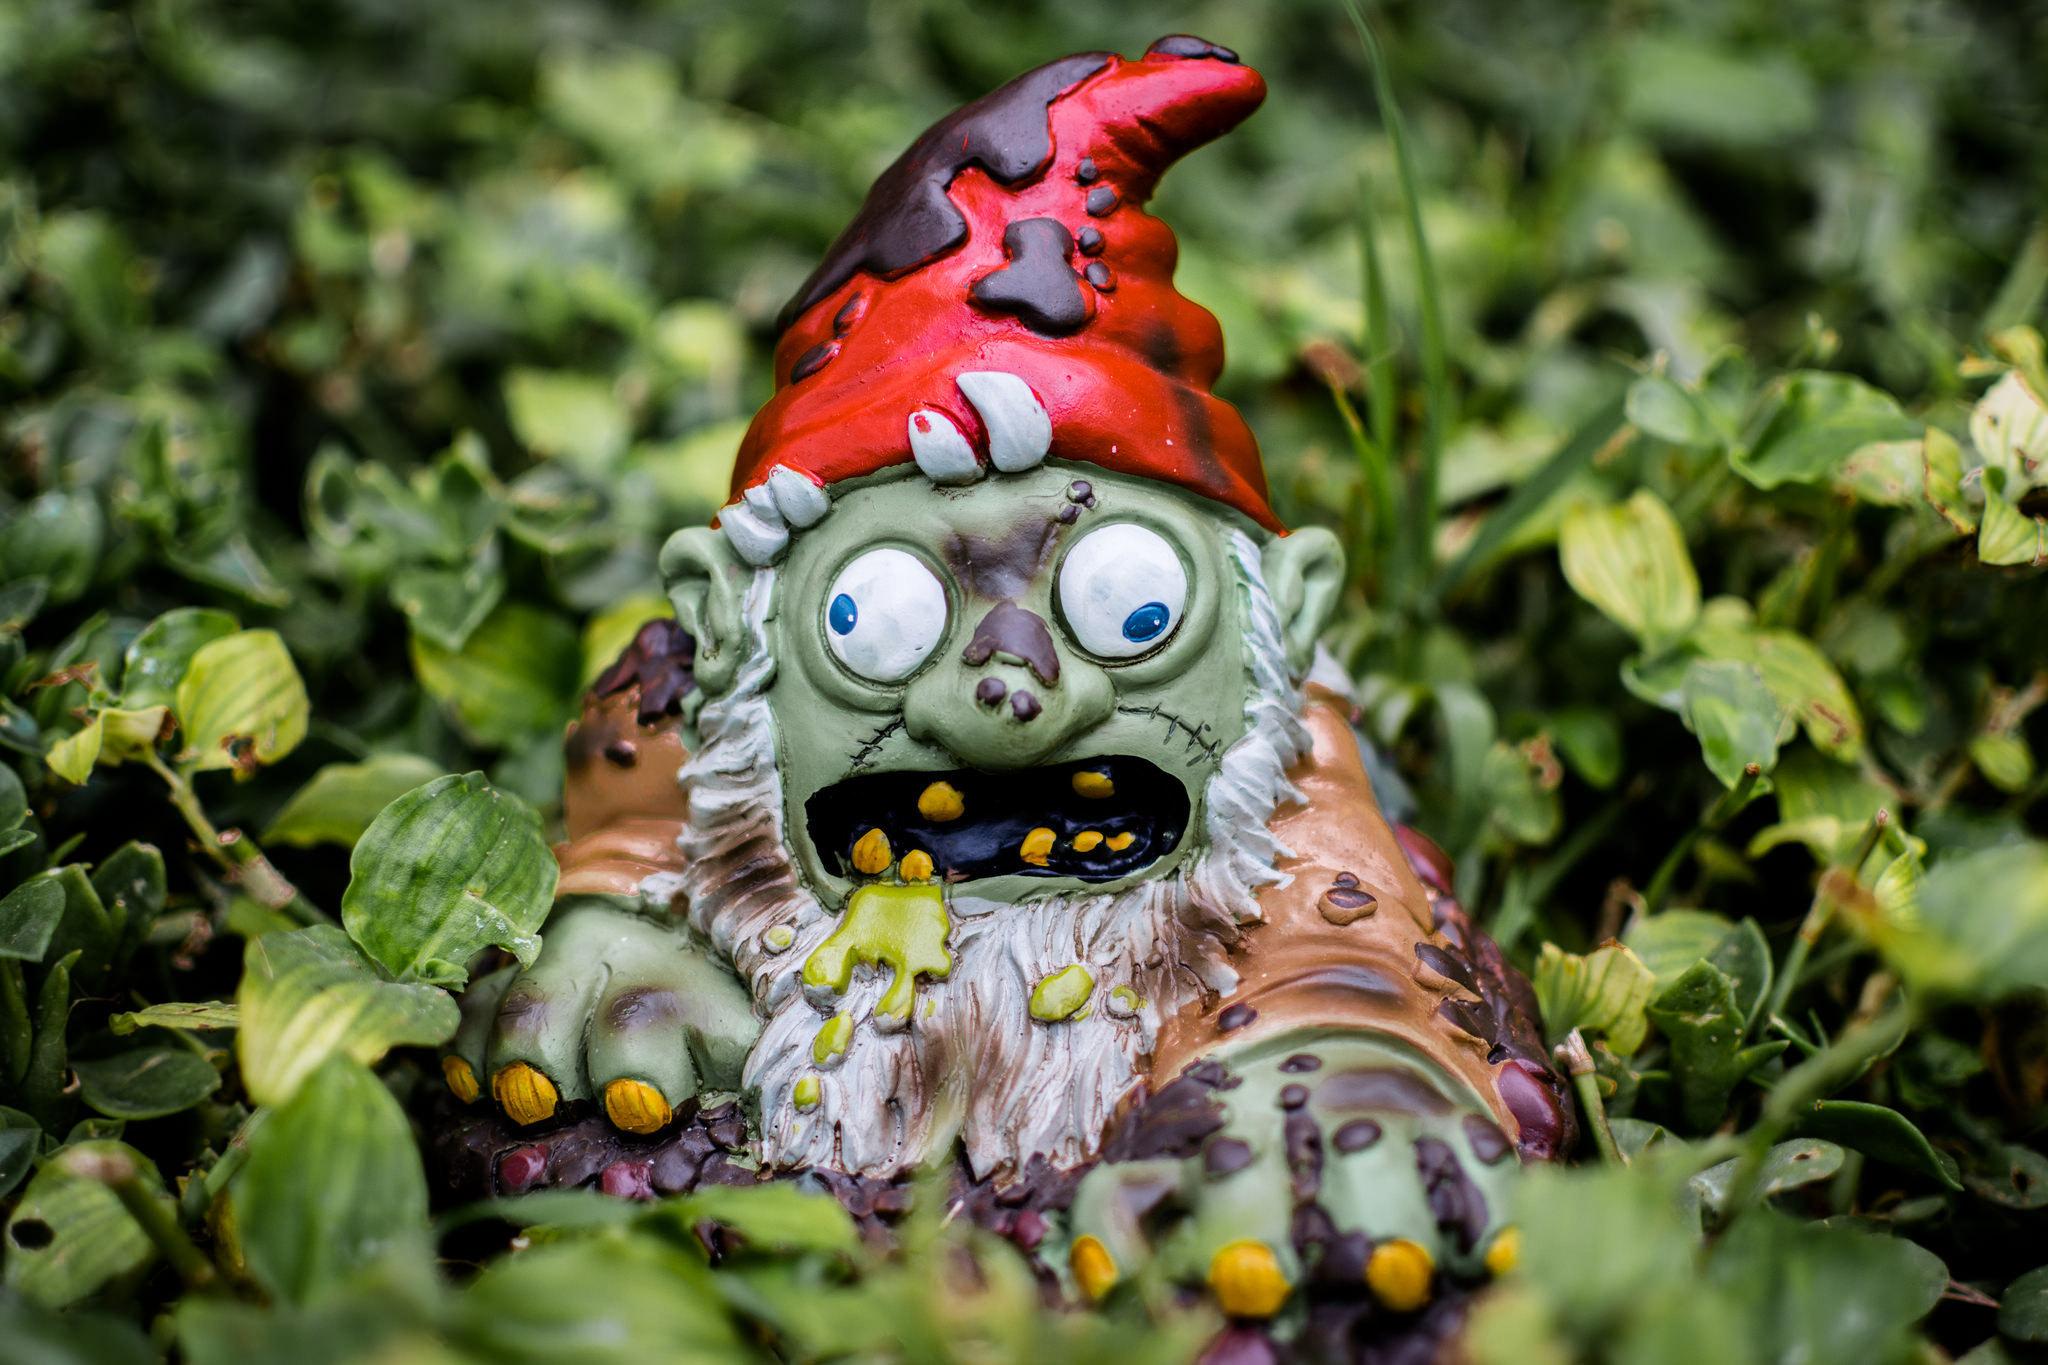 Gnome In Garden: Zombie Garden Gnome In Koreatown